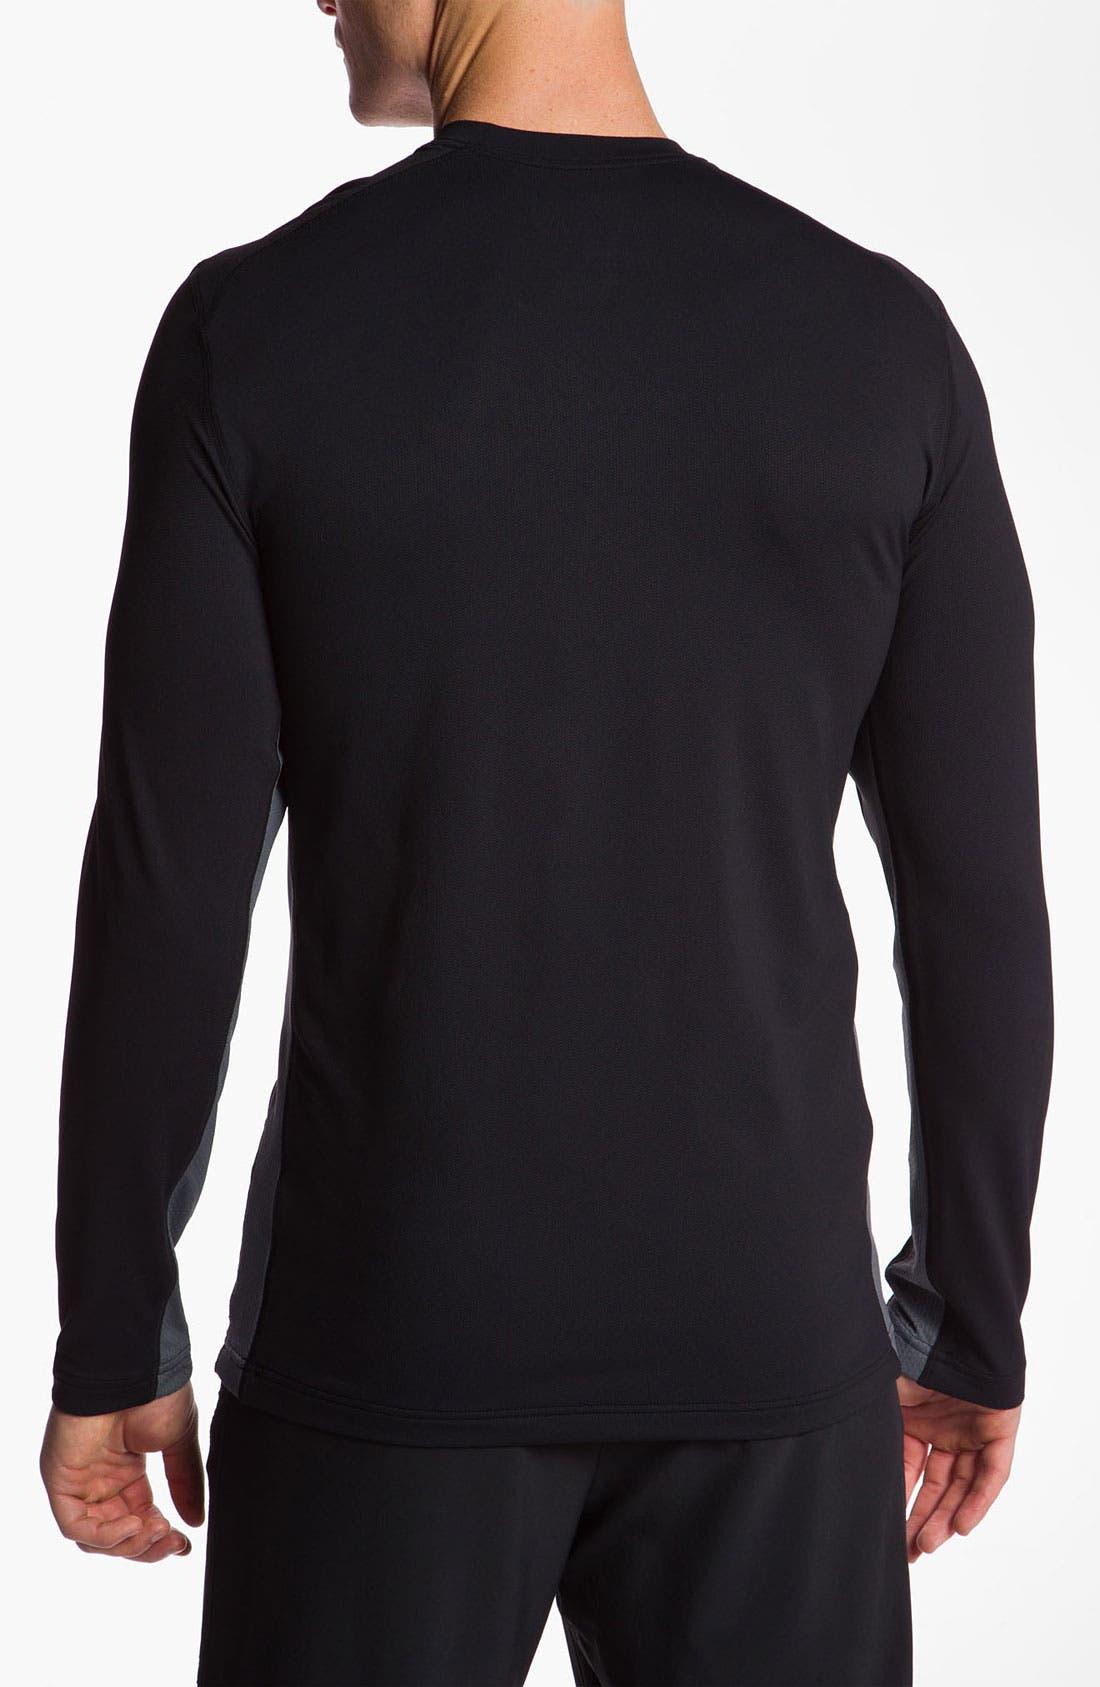 Alternate Image 2  - Nike 'Edge' Dri-FIT Top